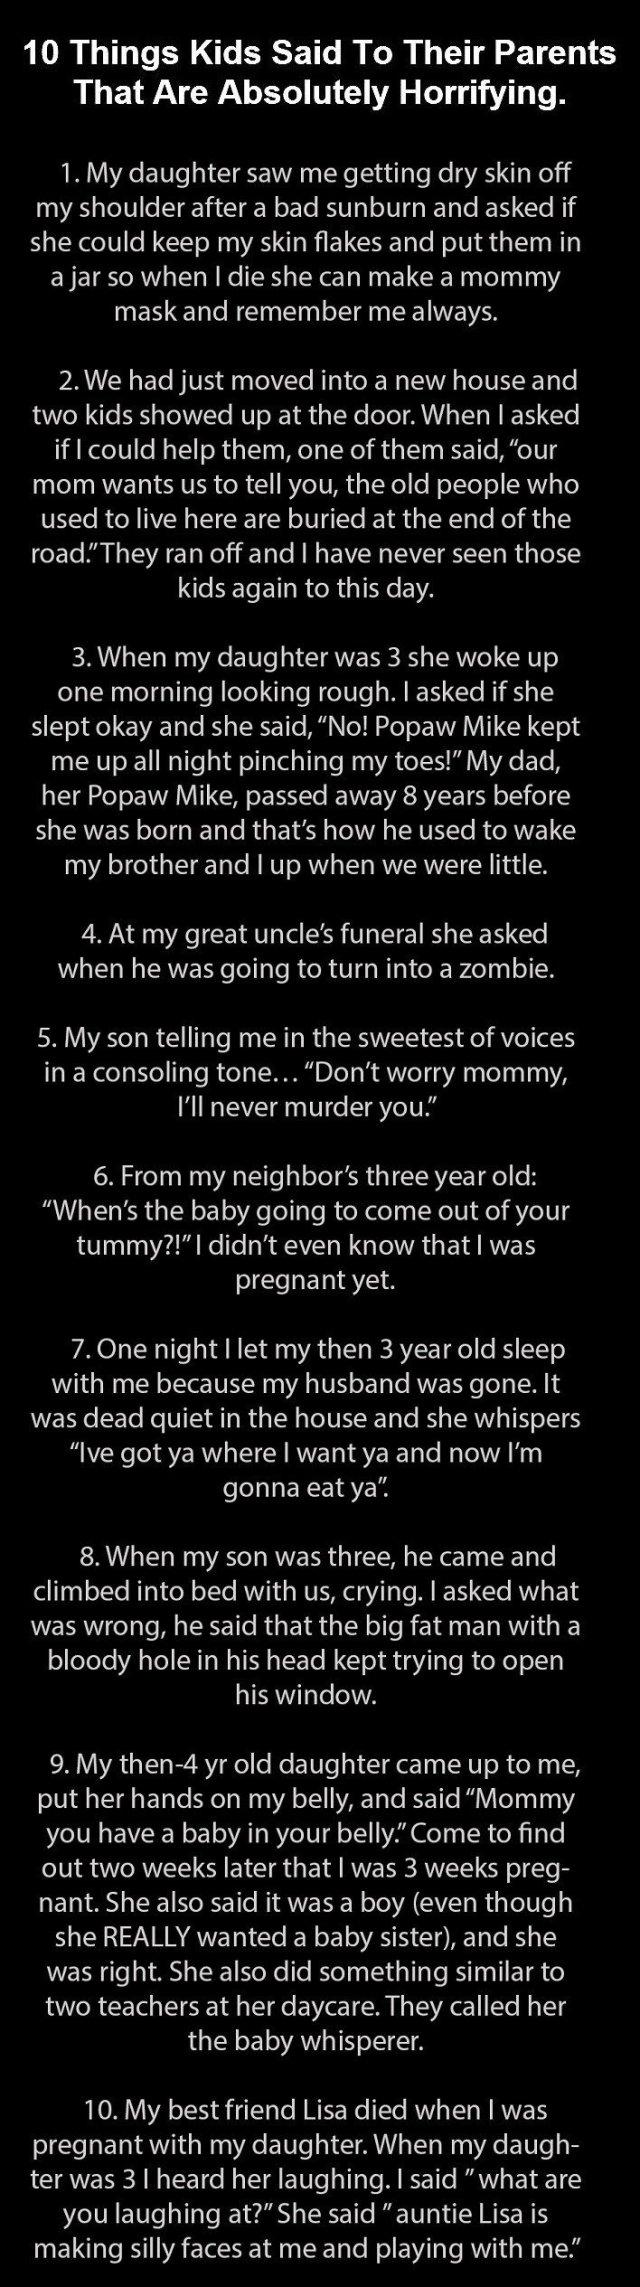 10-creepy-kids